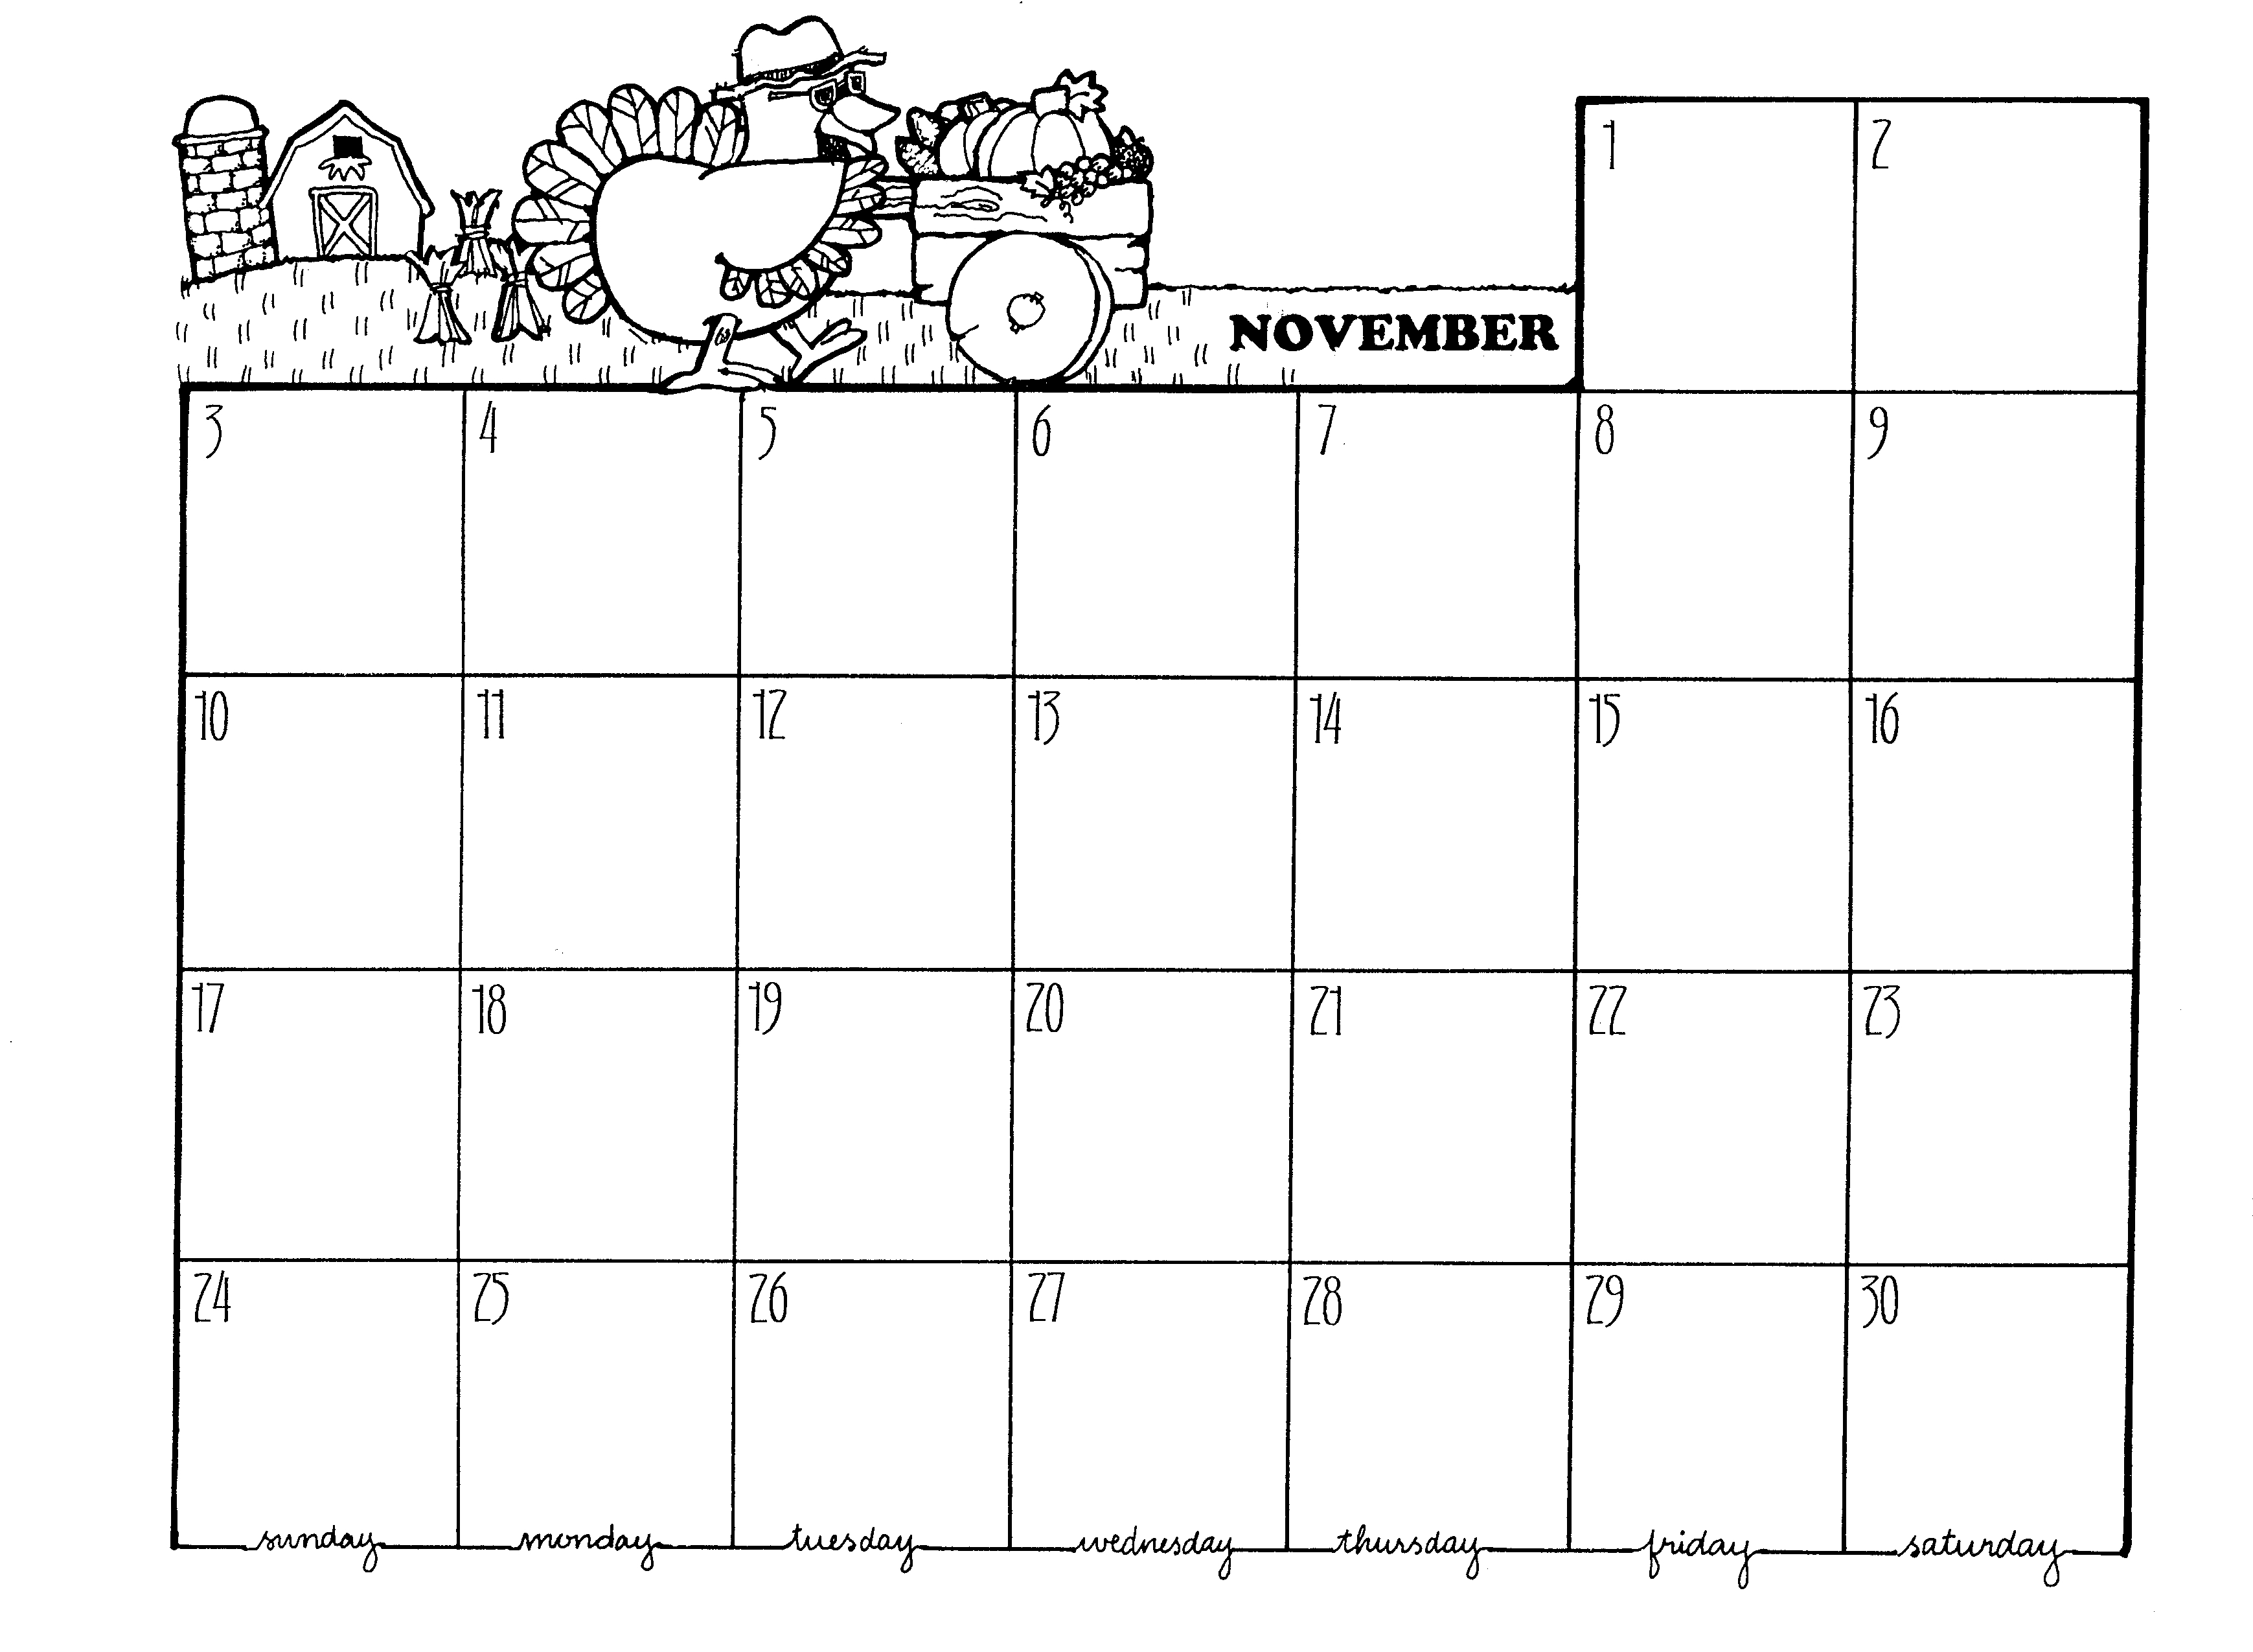 Blank November 2015 Calendar Printable With Turkey | Calendar Template ...